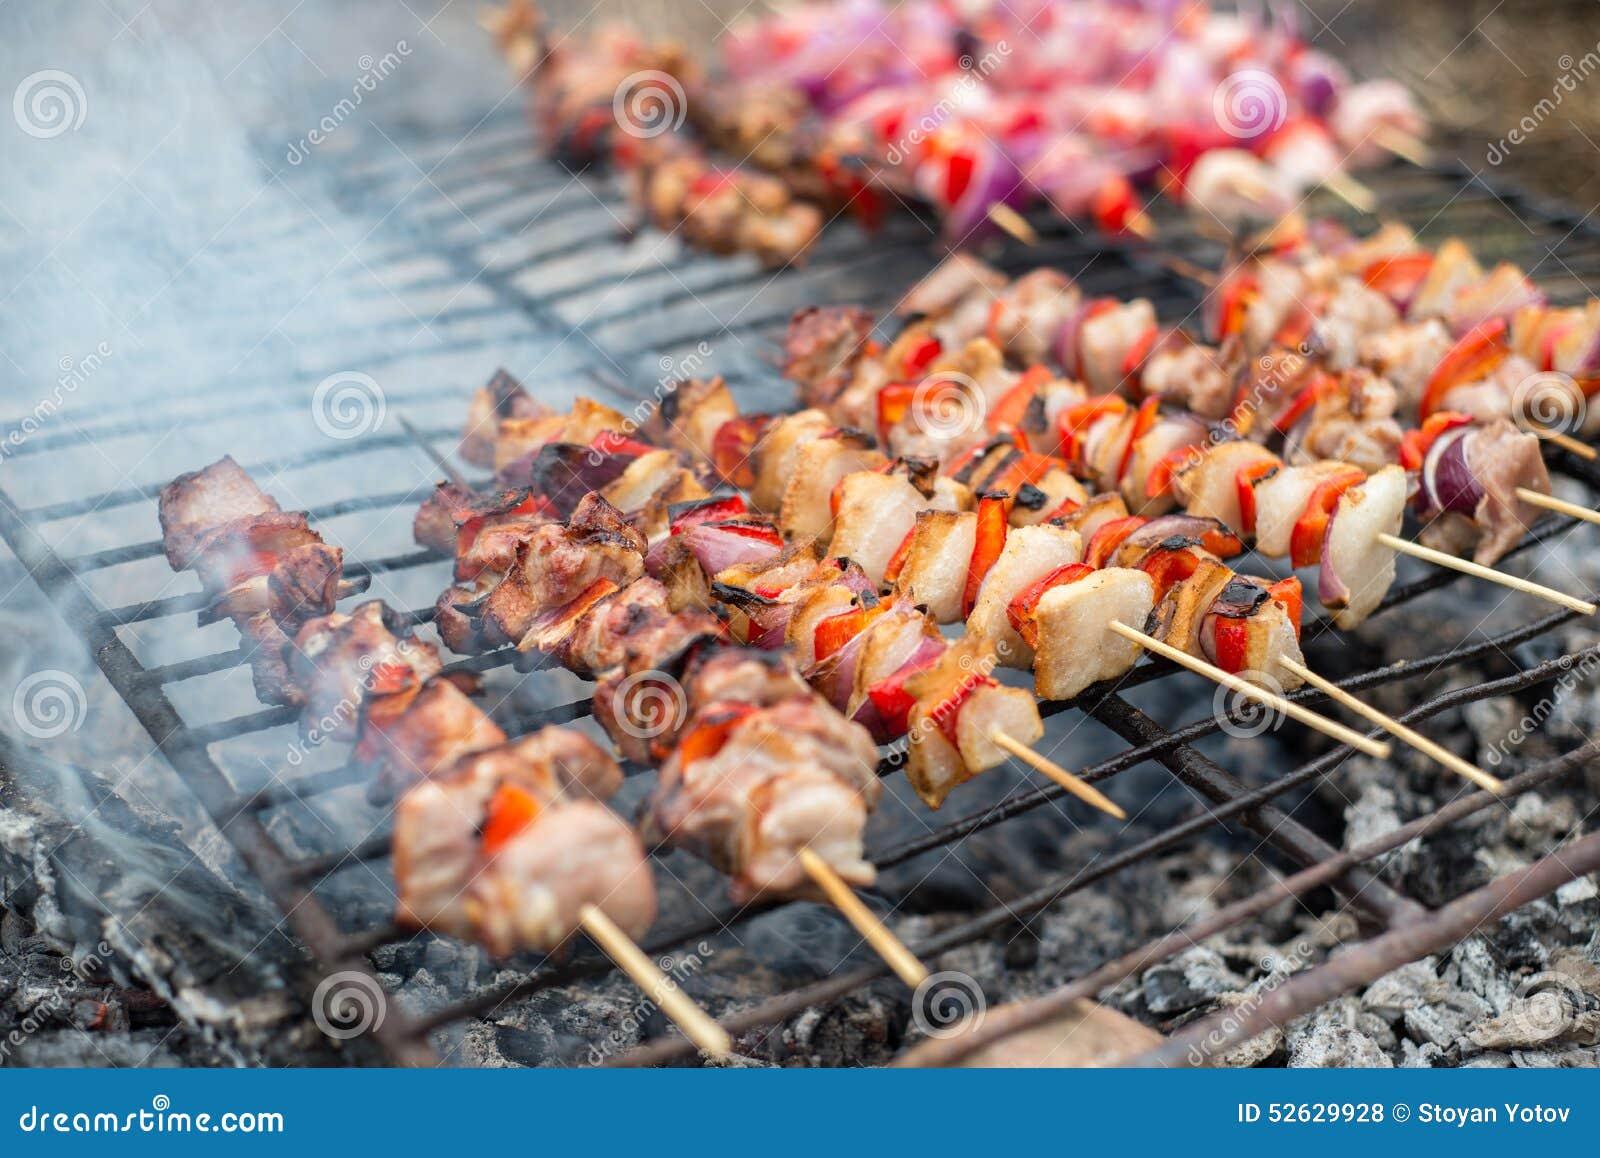 Viande app tissante sur un barbecue photo stock image for Quelle viande pour un barbecue